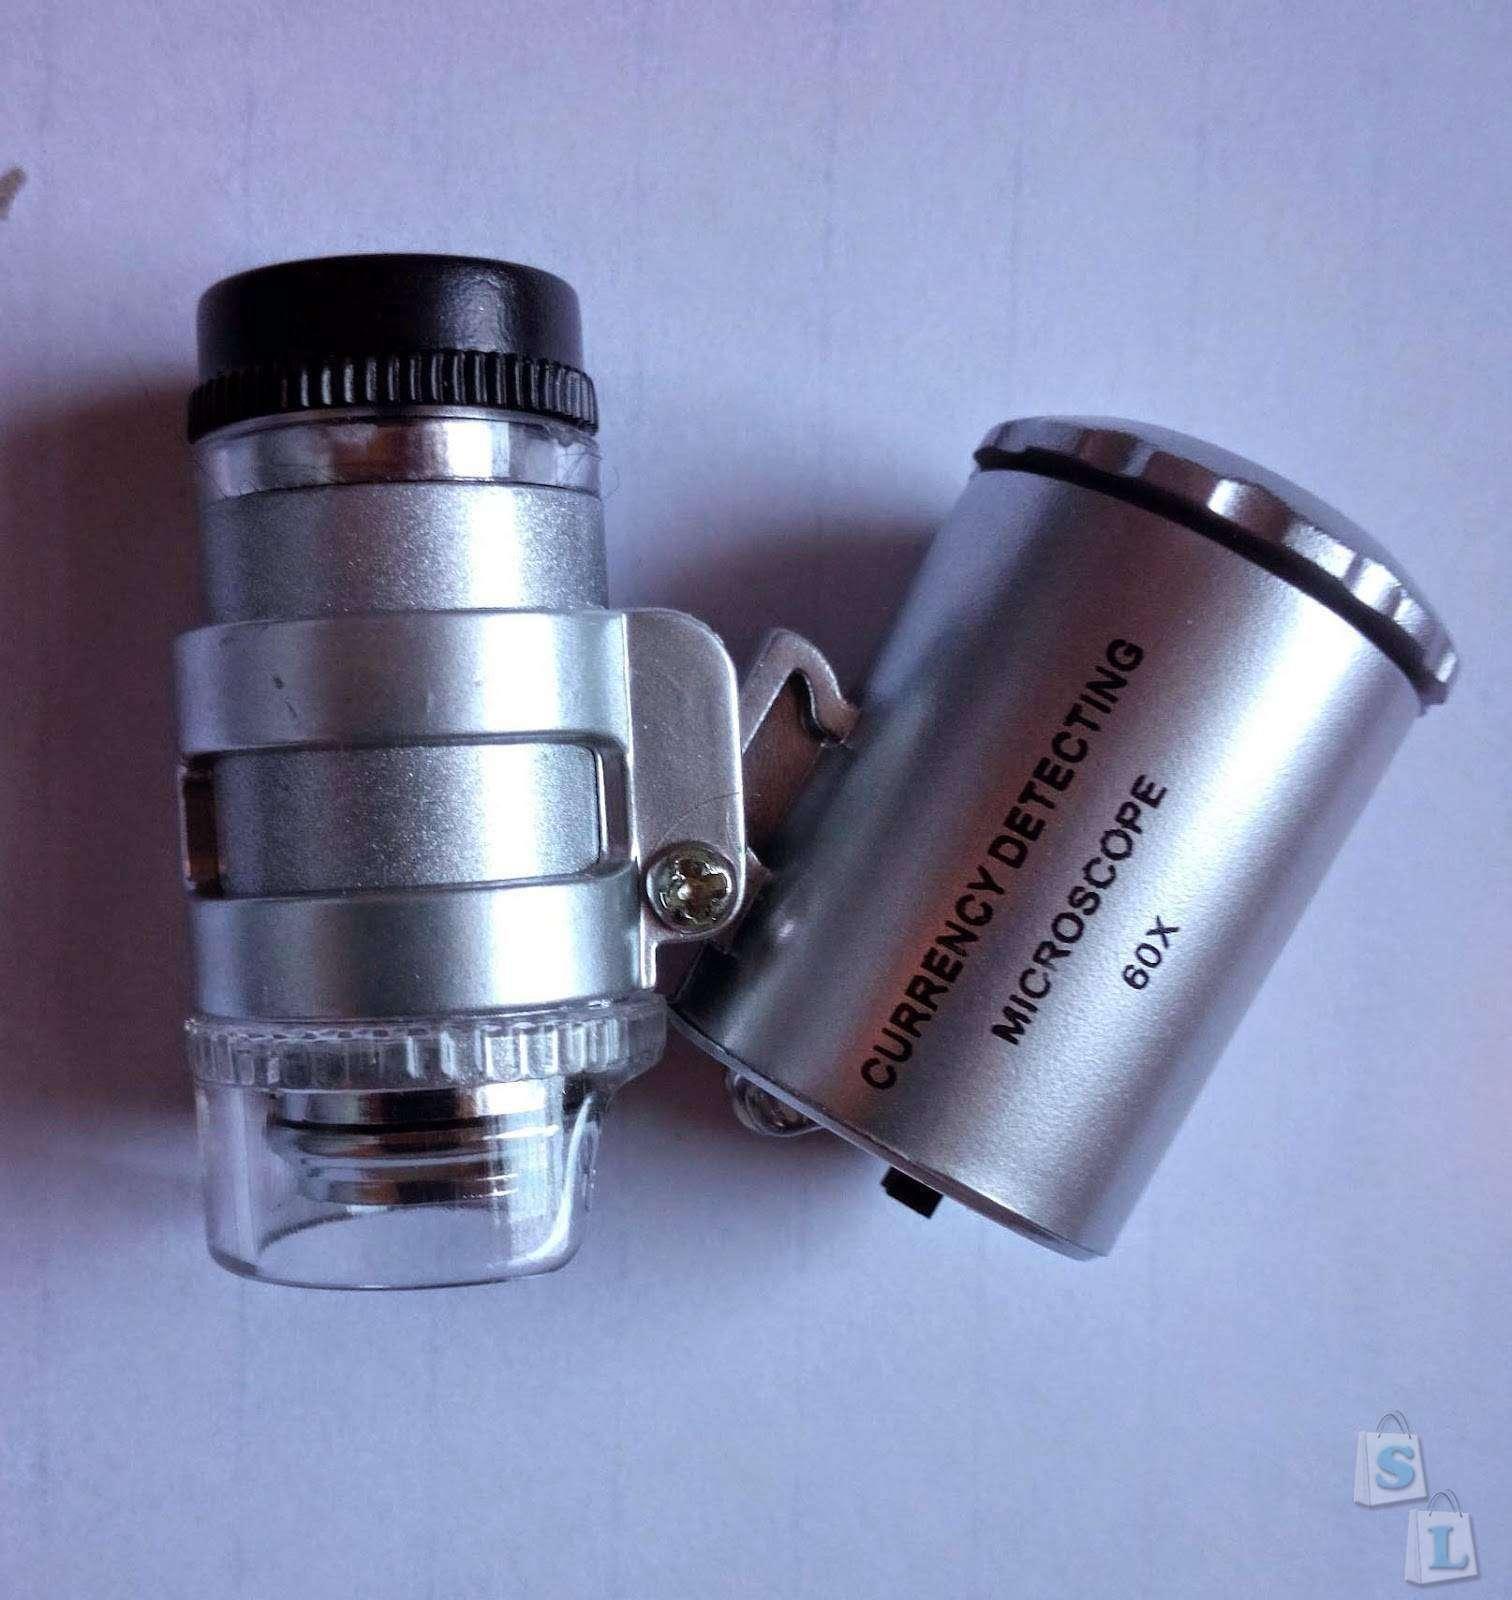 TinyDeal: Лупа с подсветкой или мини микроскоп